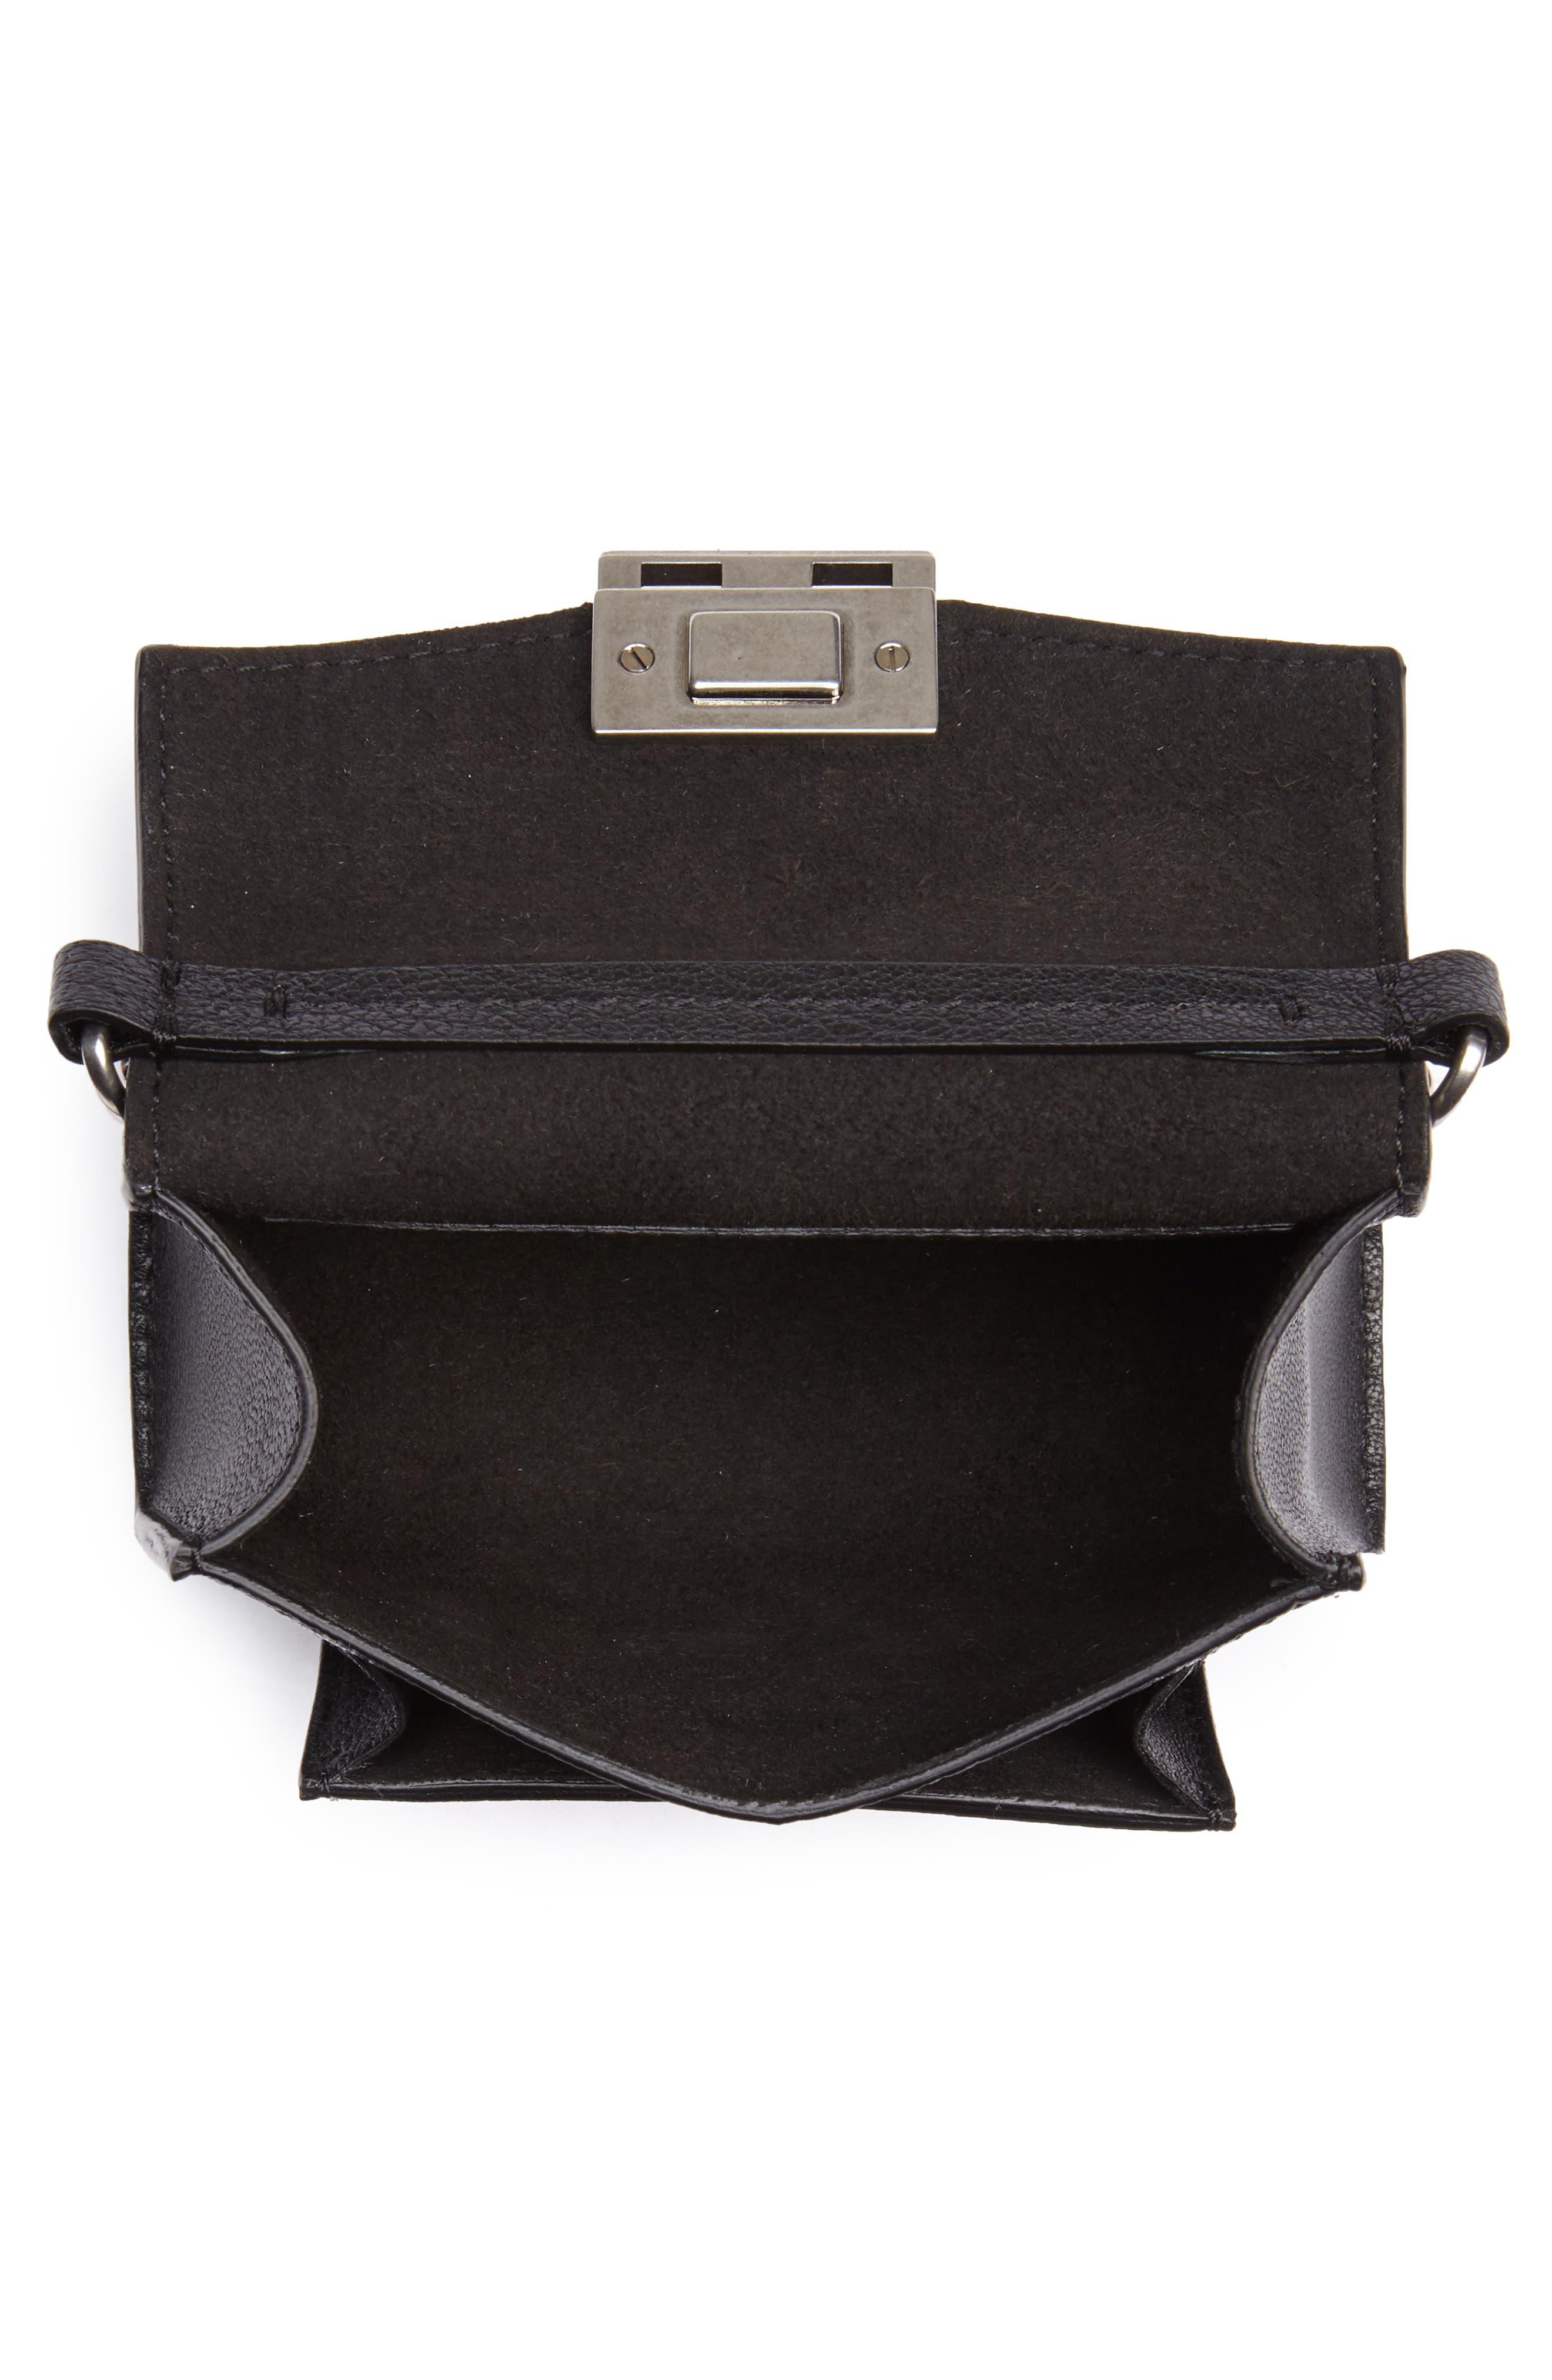 Nano GV3 Leather Crossbody Bag,                             Alternate thumbnail 4, color,                             Black